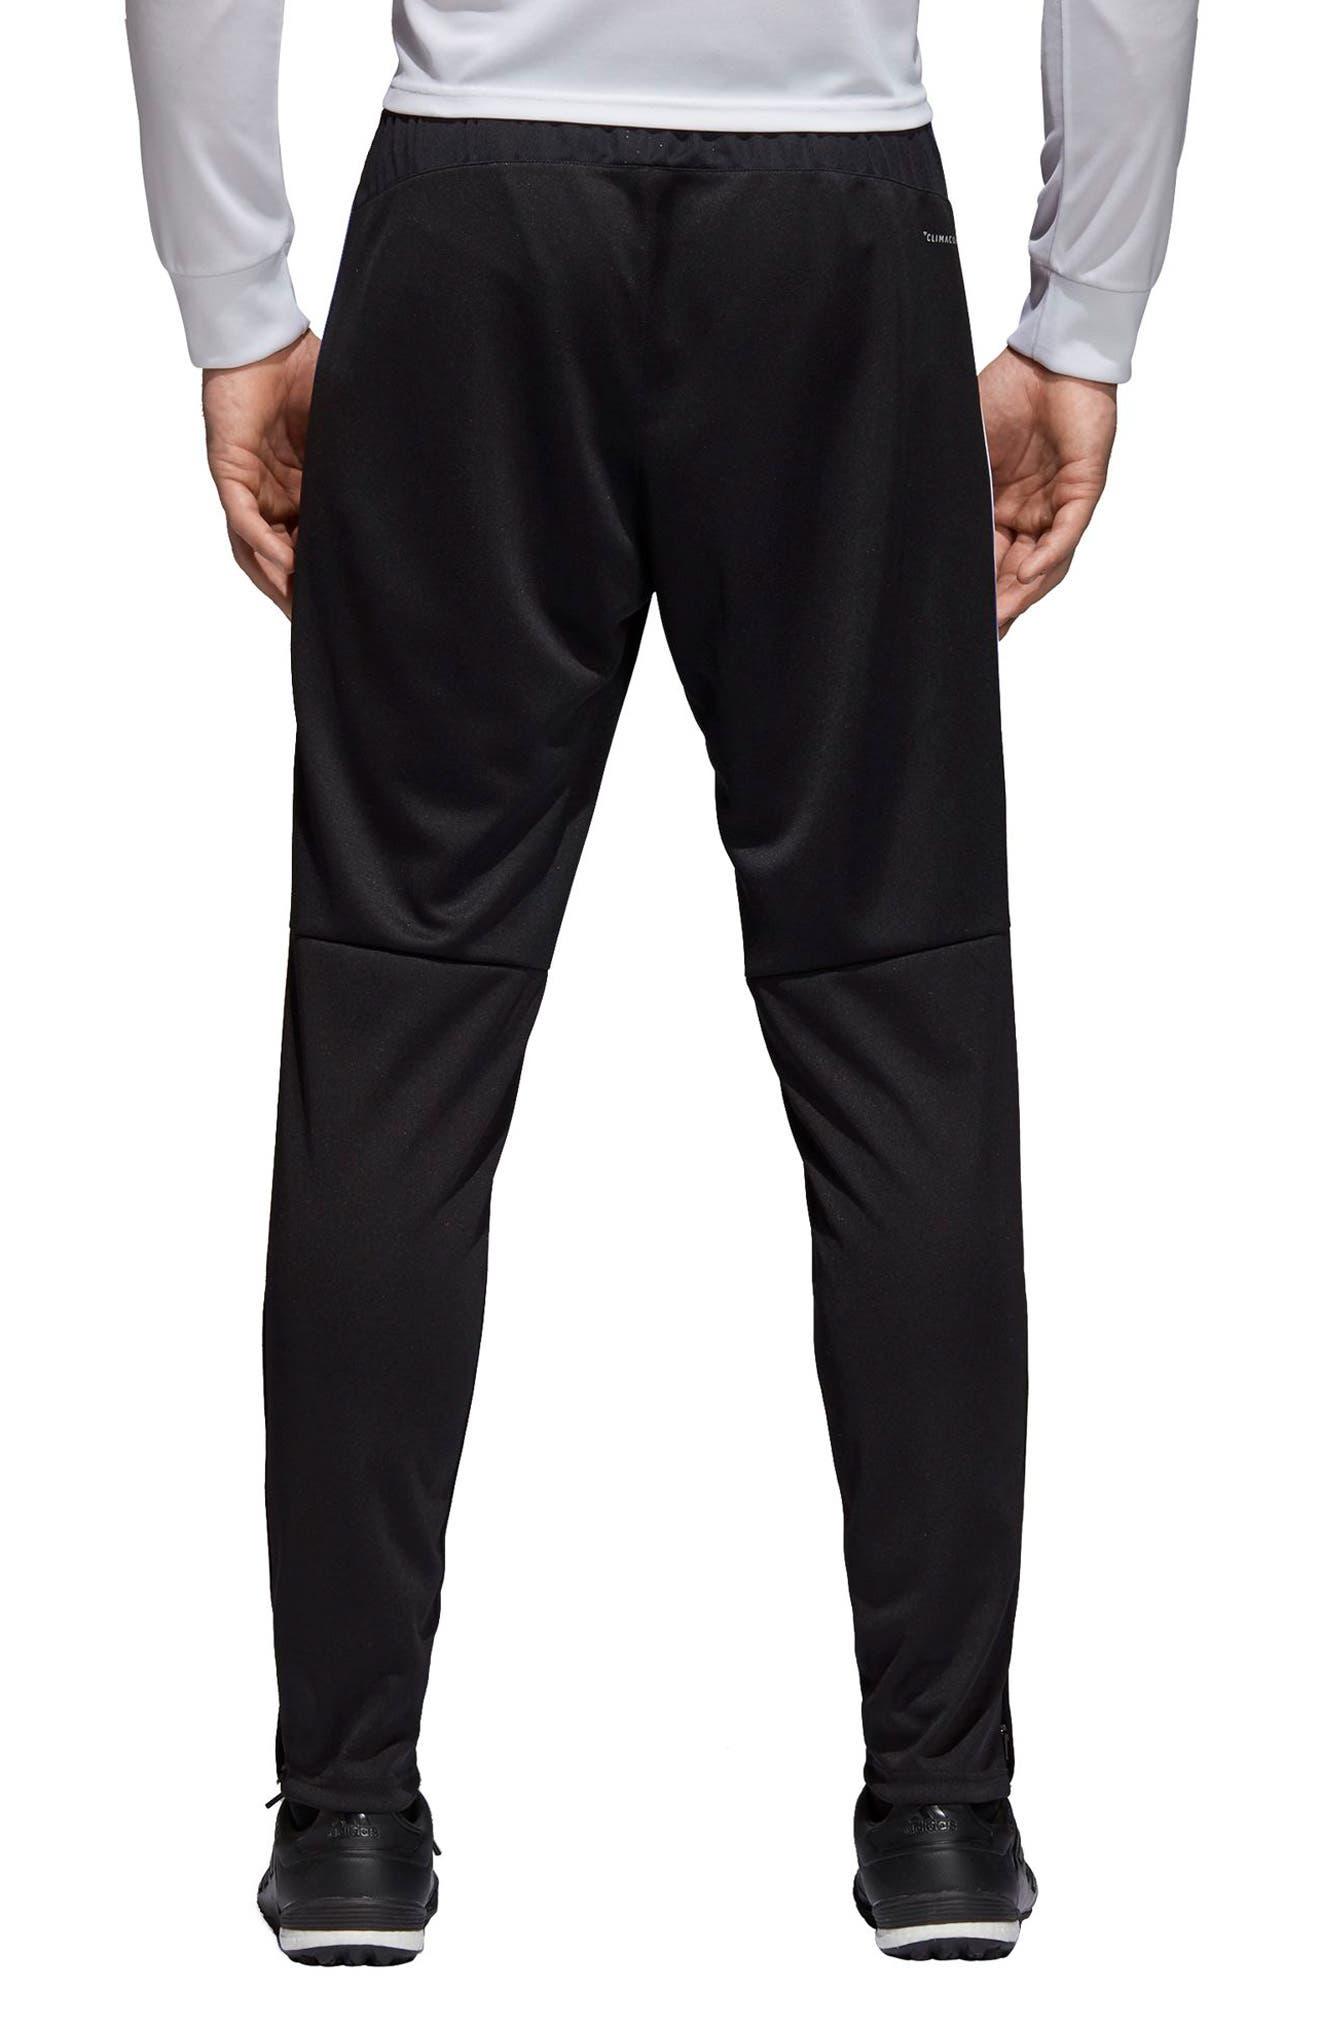 ADIDAS, Tiro 17 Regular Fit Training Pants, Alternate thumbnail 2, color, BLACK/ RED/ WHITE/ BLUE